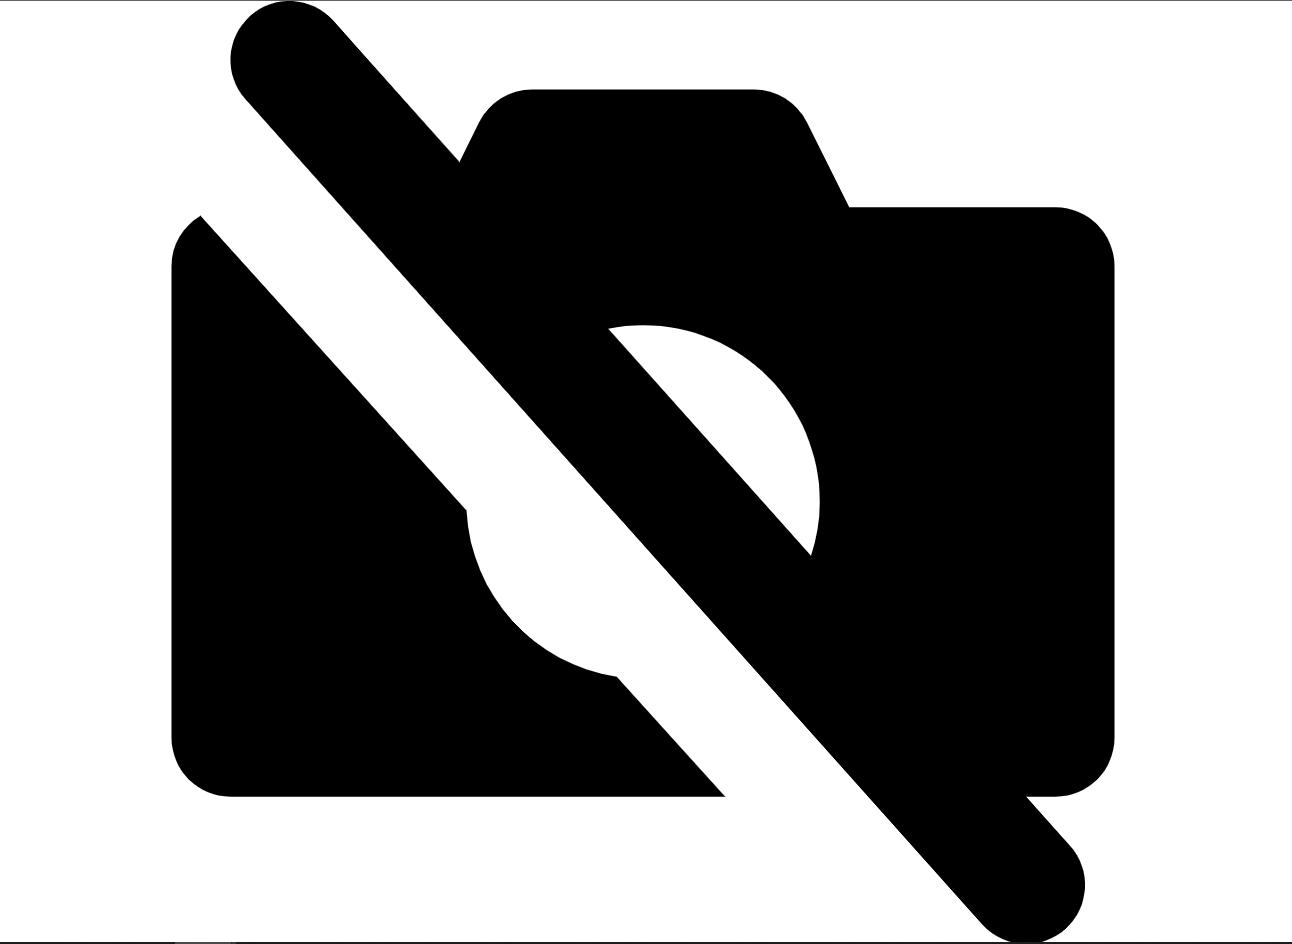 Kit Pis/anel Metal Leve Tur/ml/xl125 Std 1367